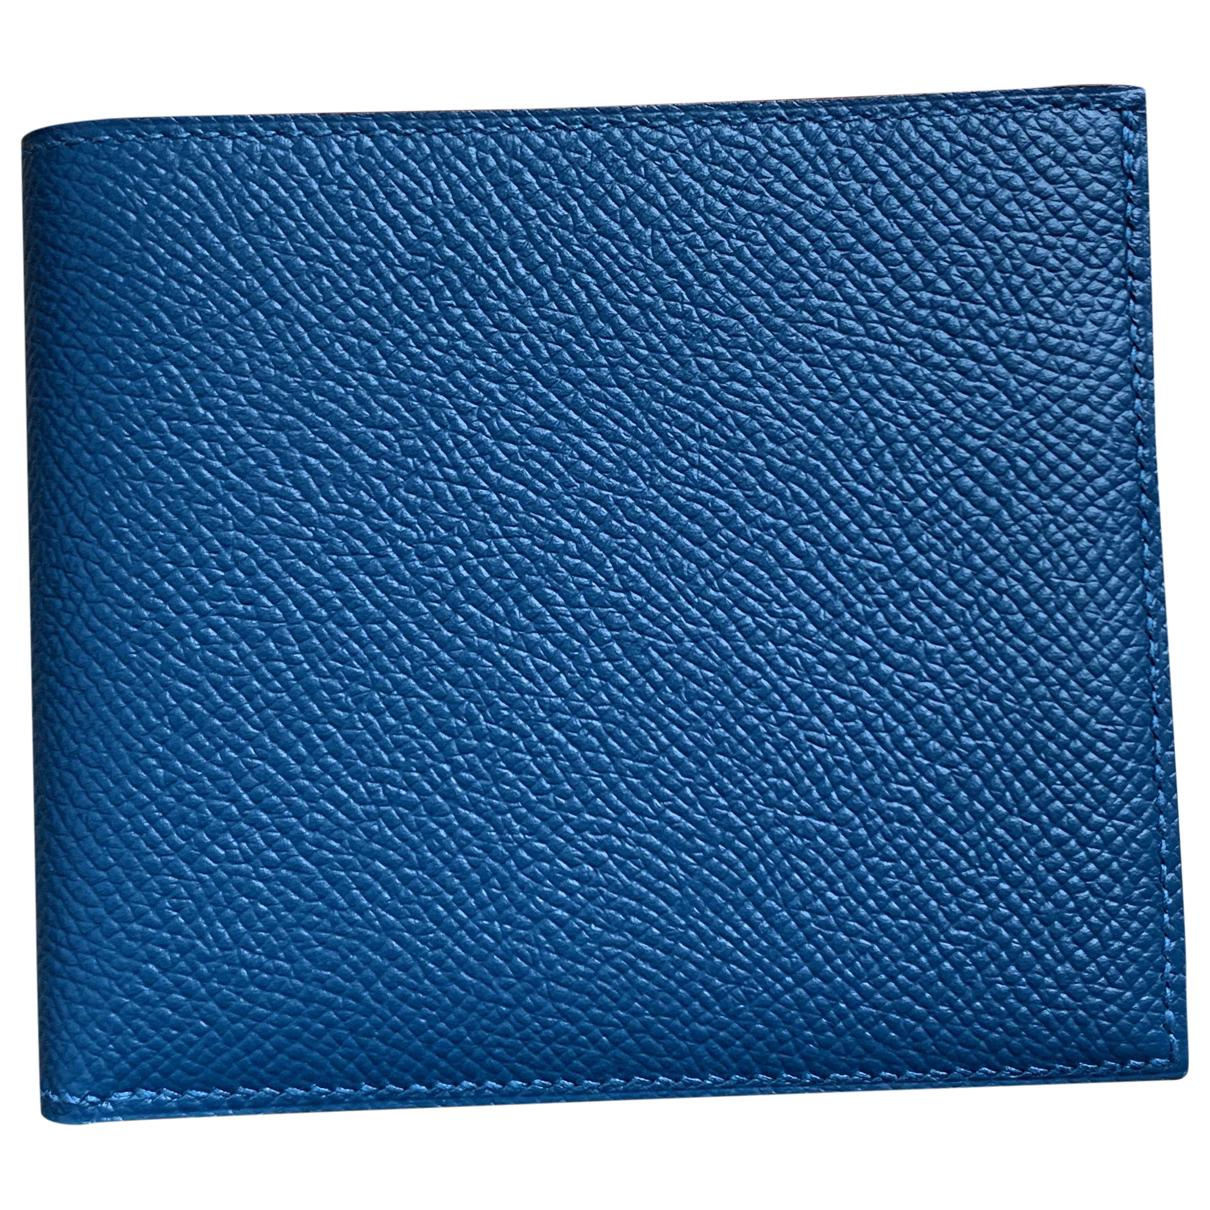 Hermes MC2 Kleinlederwaren in  Blau Leder